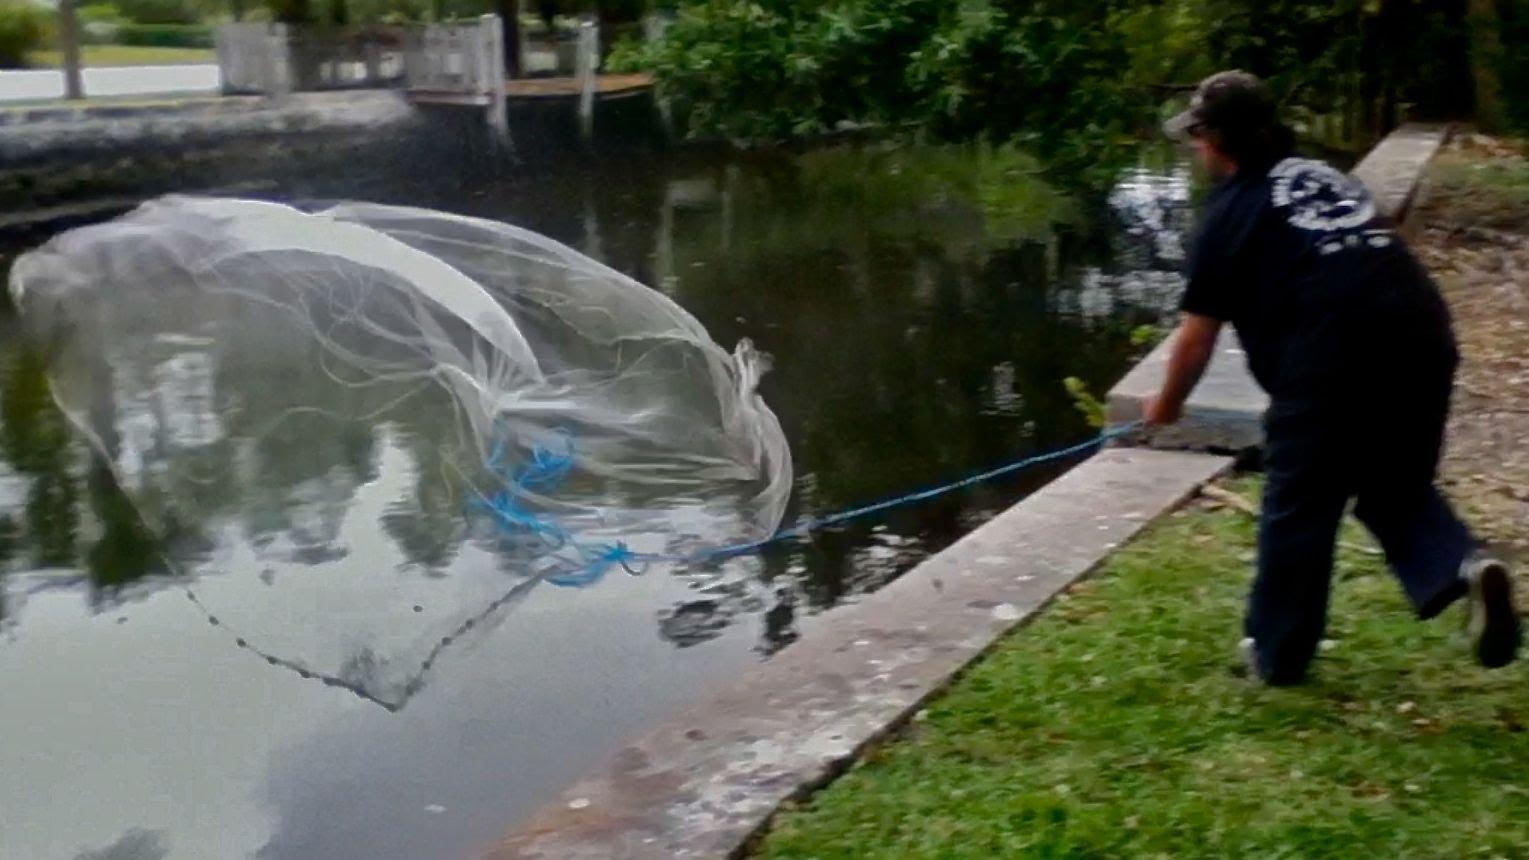 Cast Net Throwing! NINJA STYLE Amazing Accuracy On Moving Fish